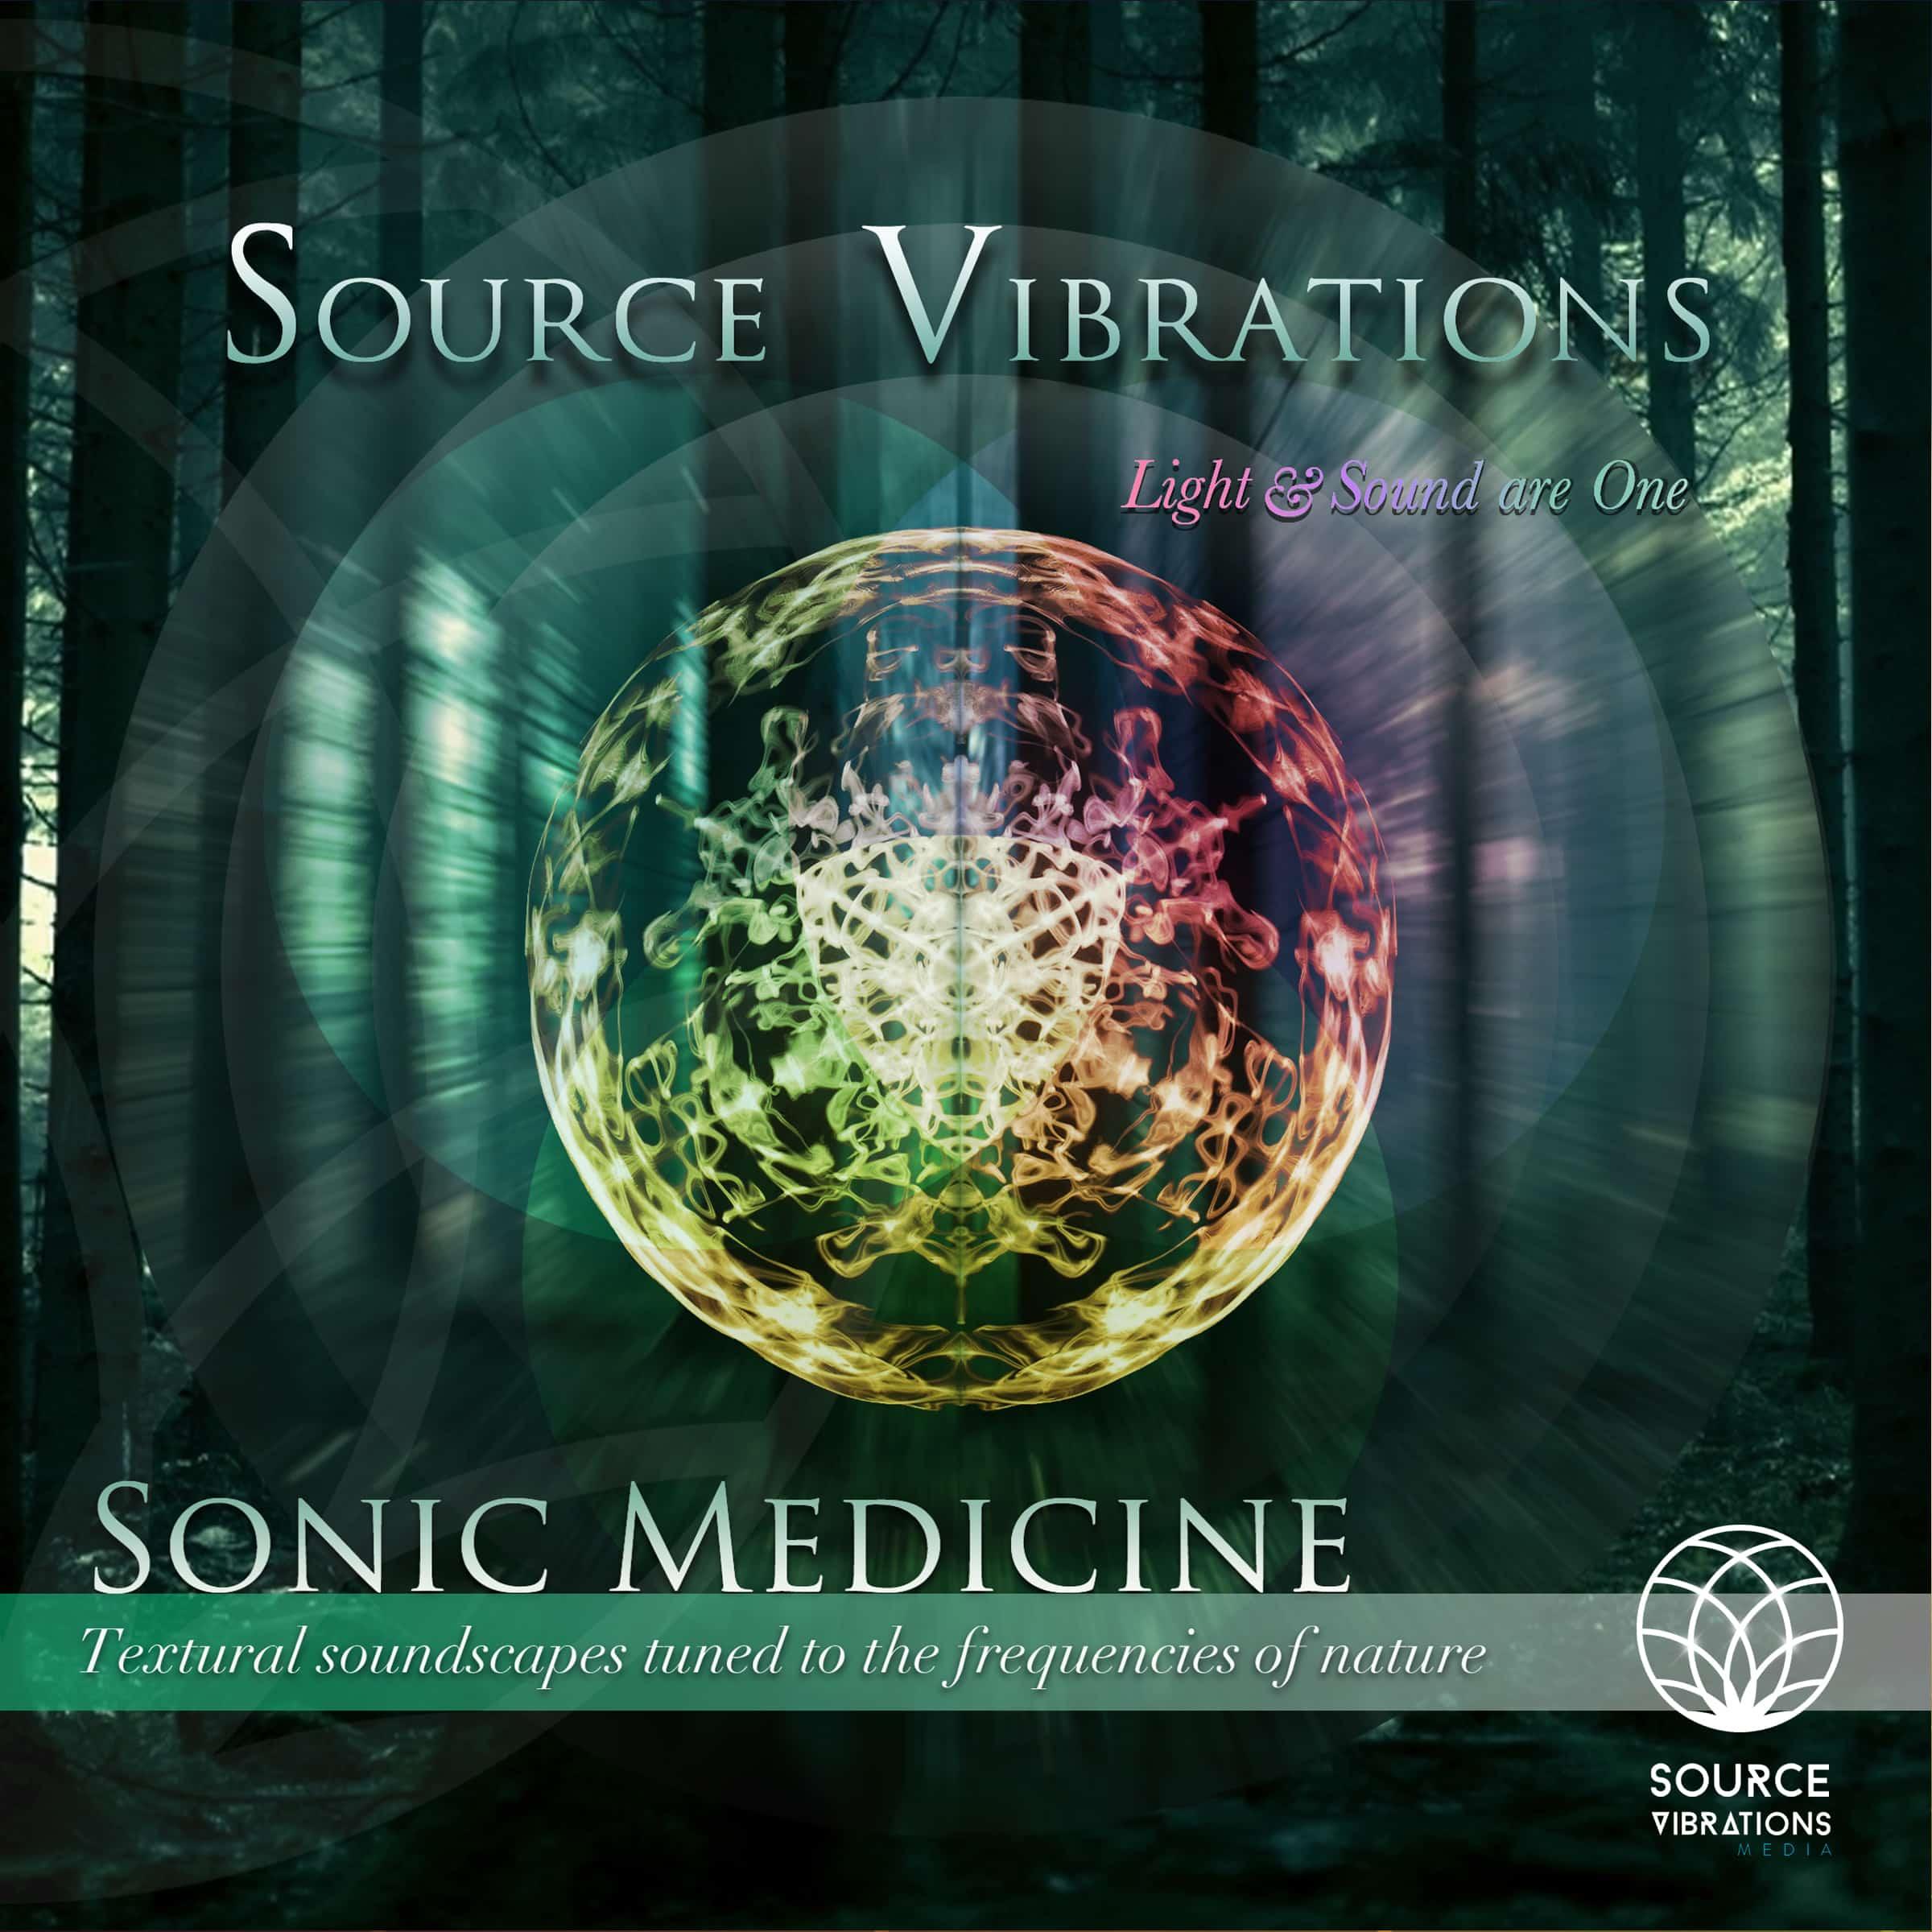 Sonic Medicine